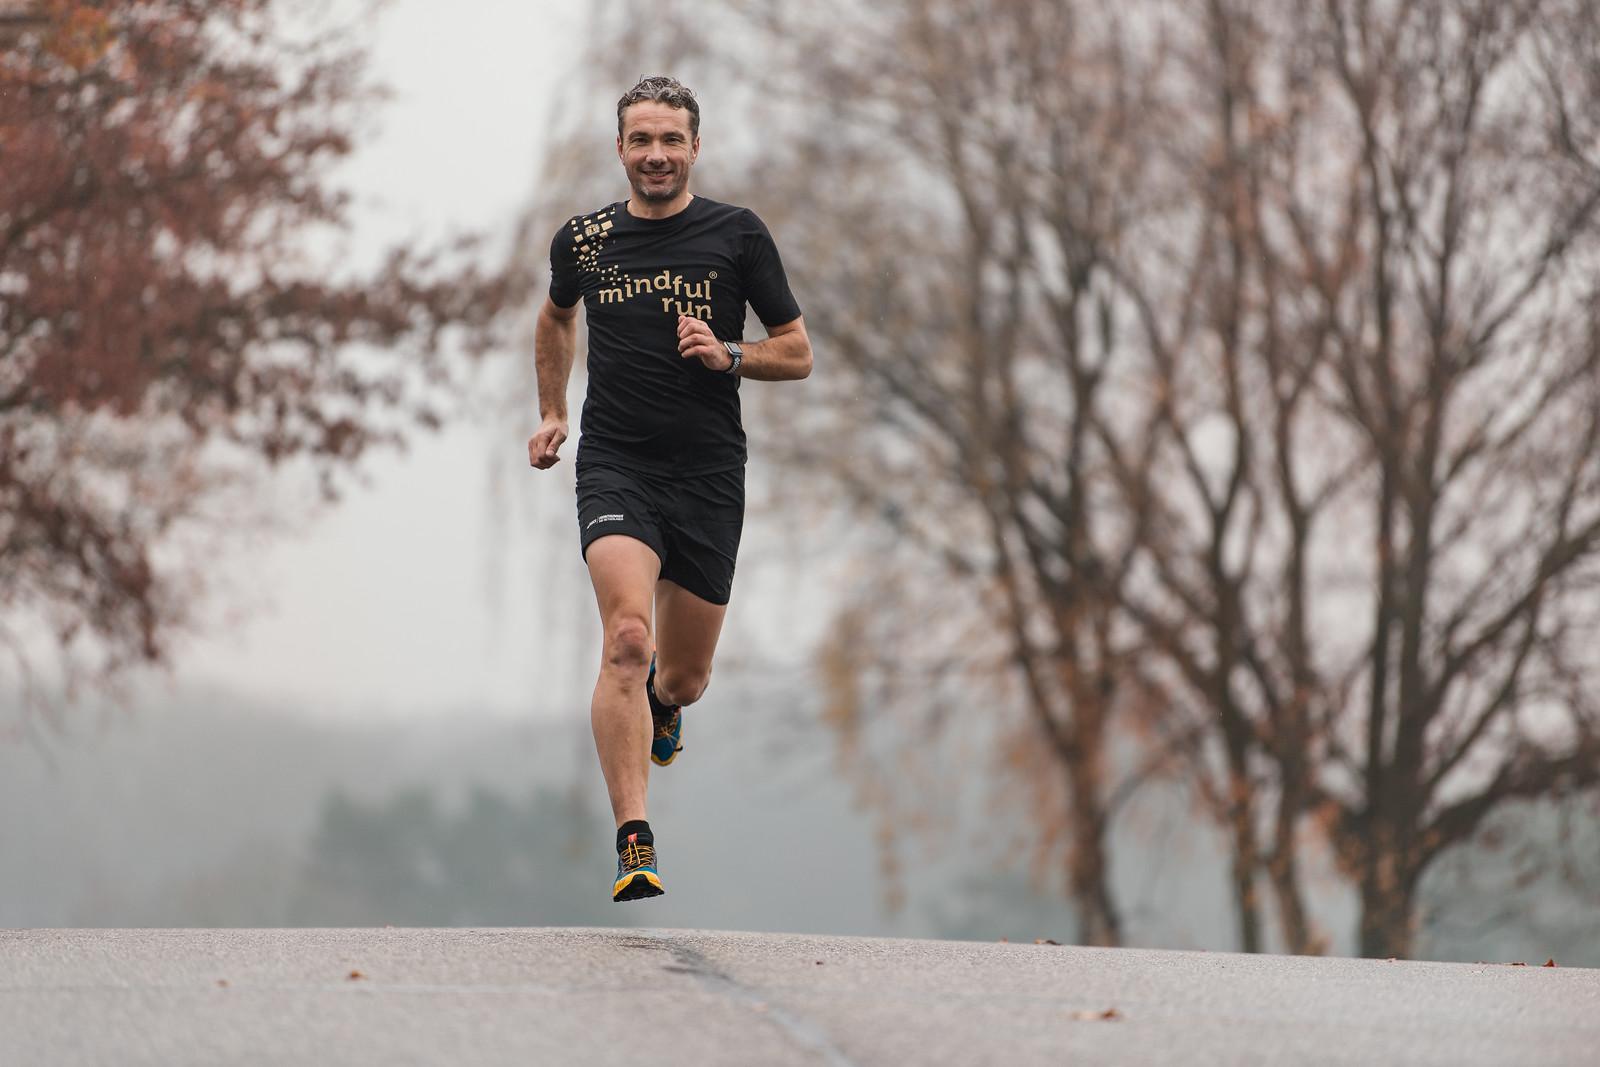 Mindful Run in 6 stappen!